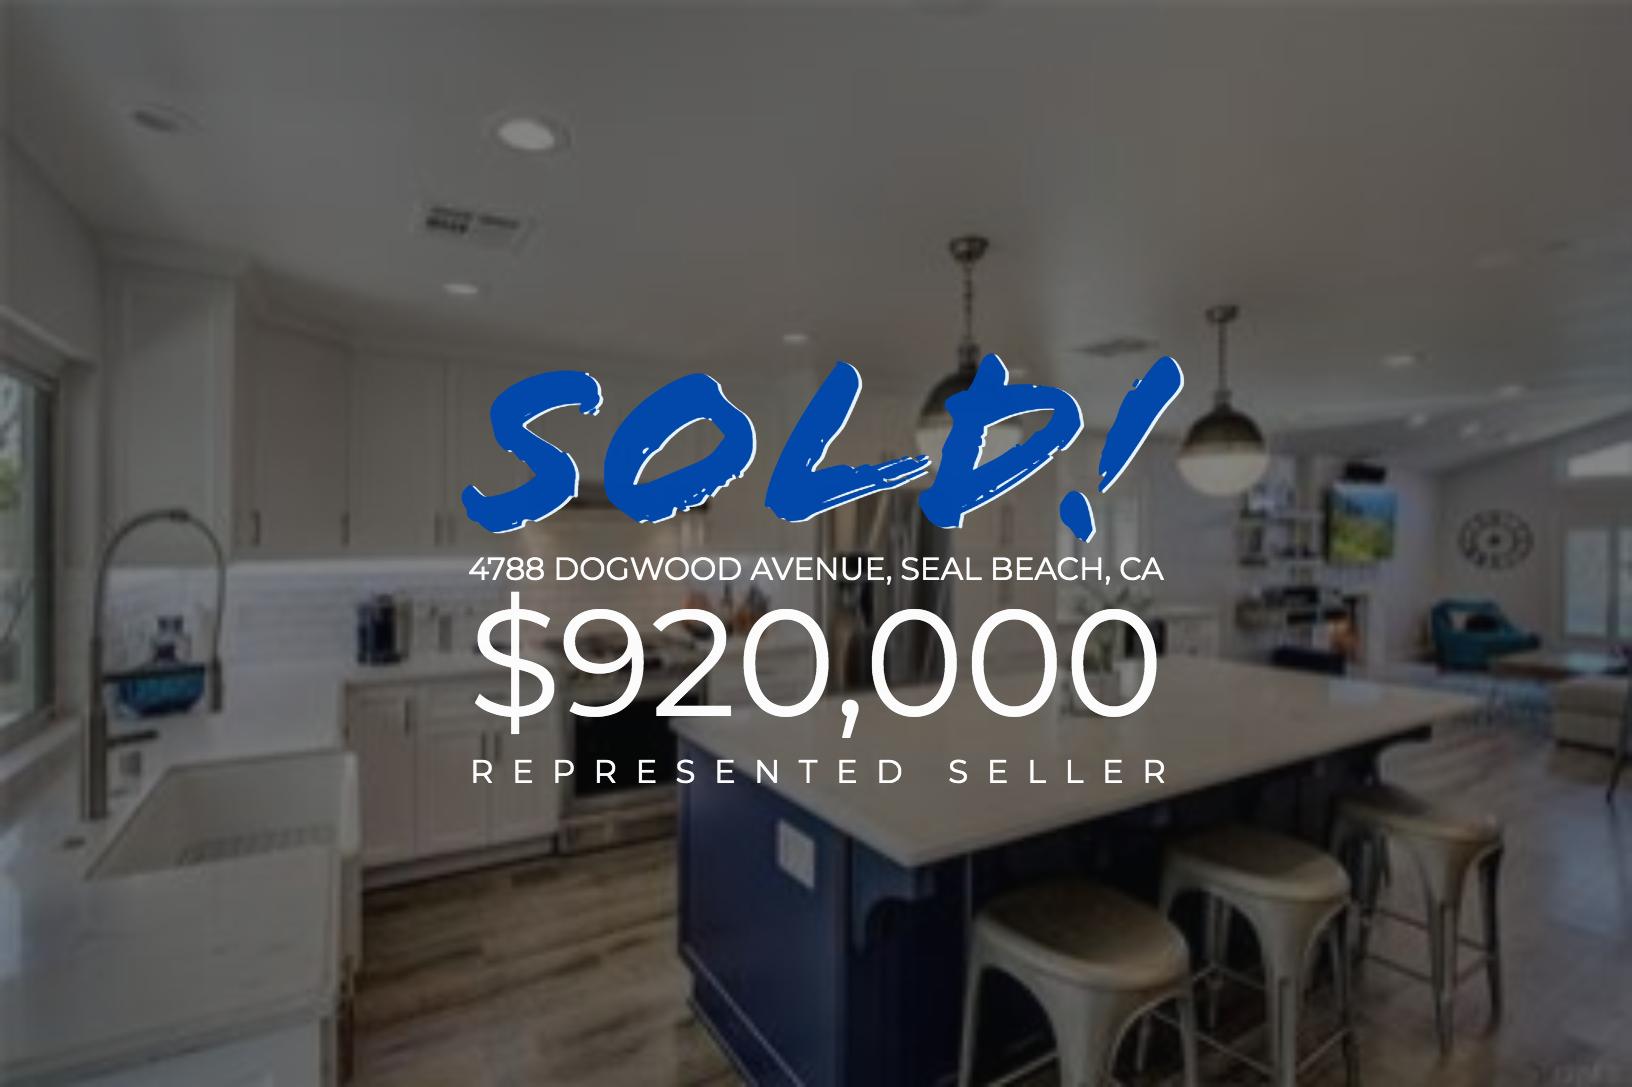 Sold With Matt Blashaw 4788 Dogwood Avenue in Seal Beach, CA